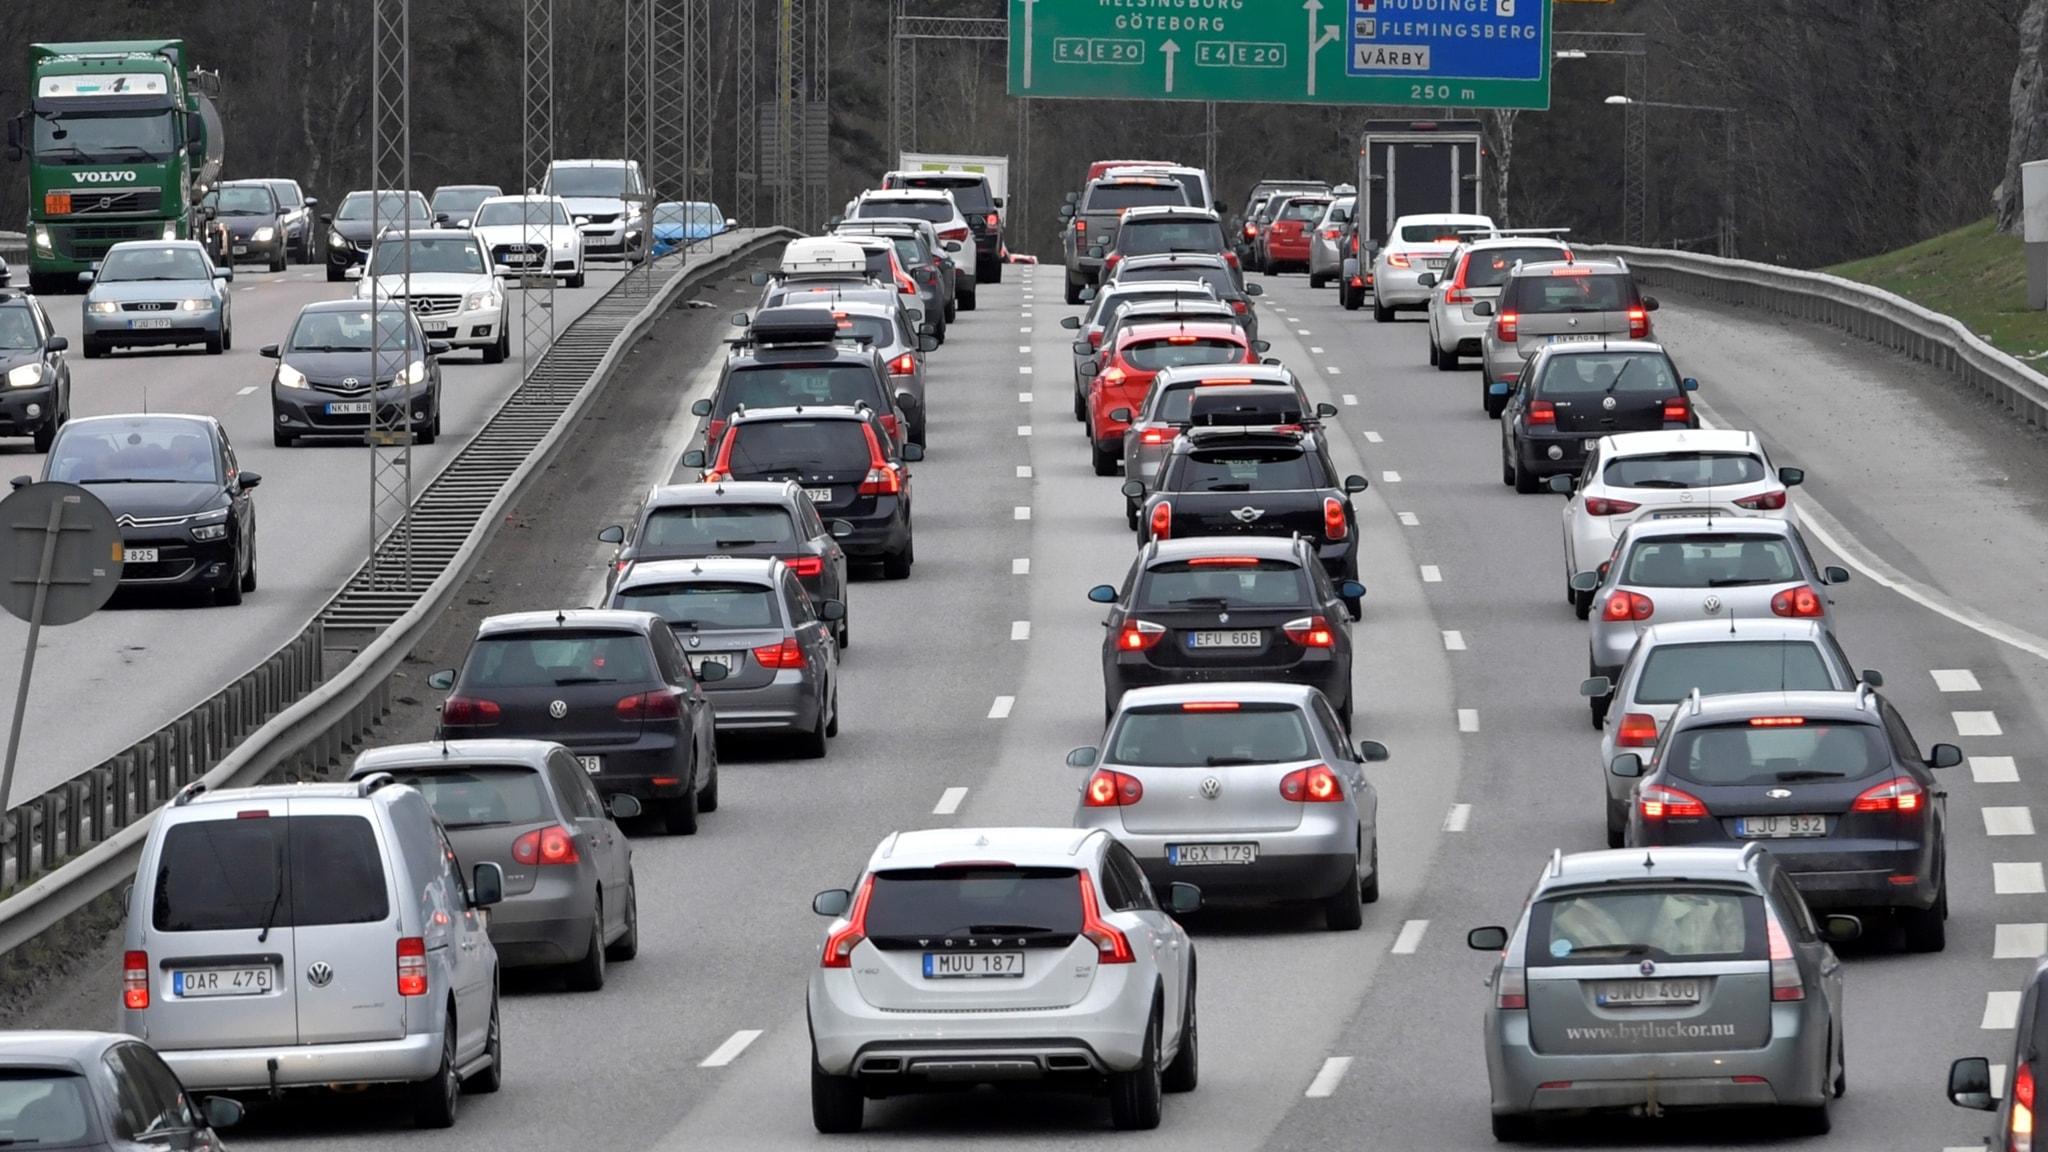 Rally i bilhallen – men vem tänker på klimatet? (R)